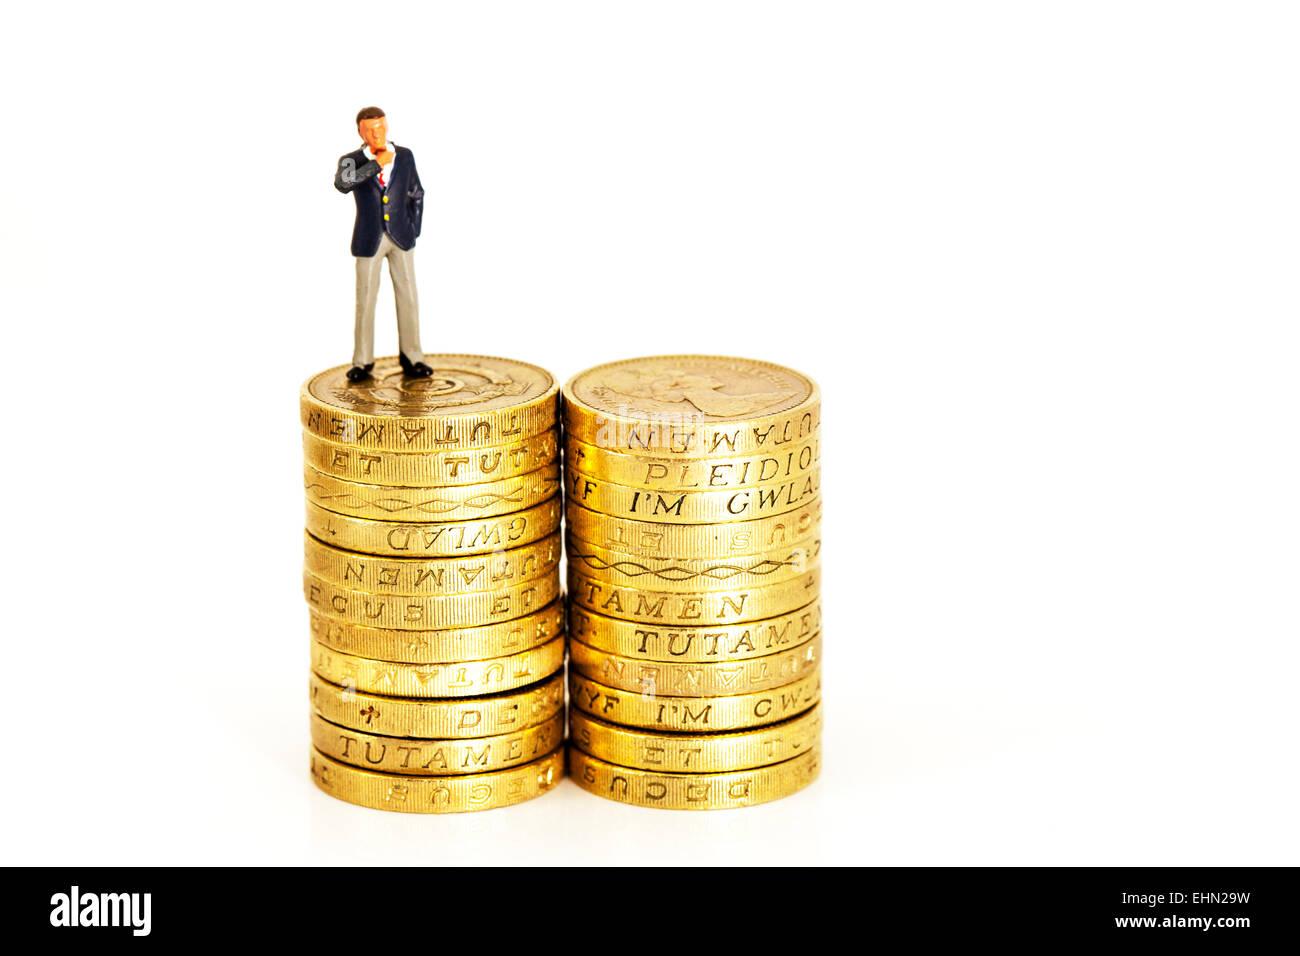 finance financial finances fat cats coins earnings executive executives man management mini miniature money pay - Stock Image